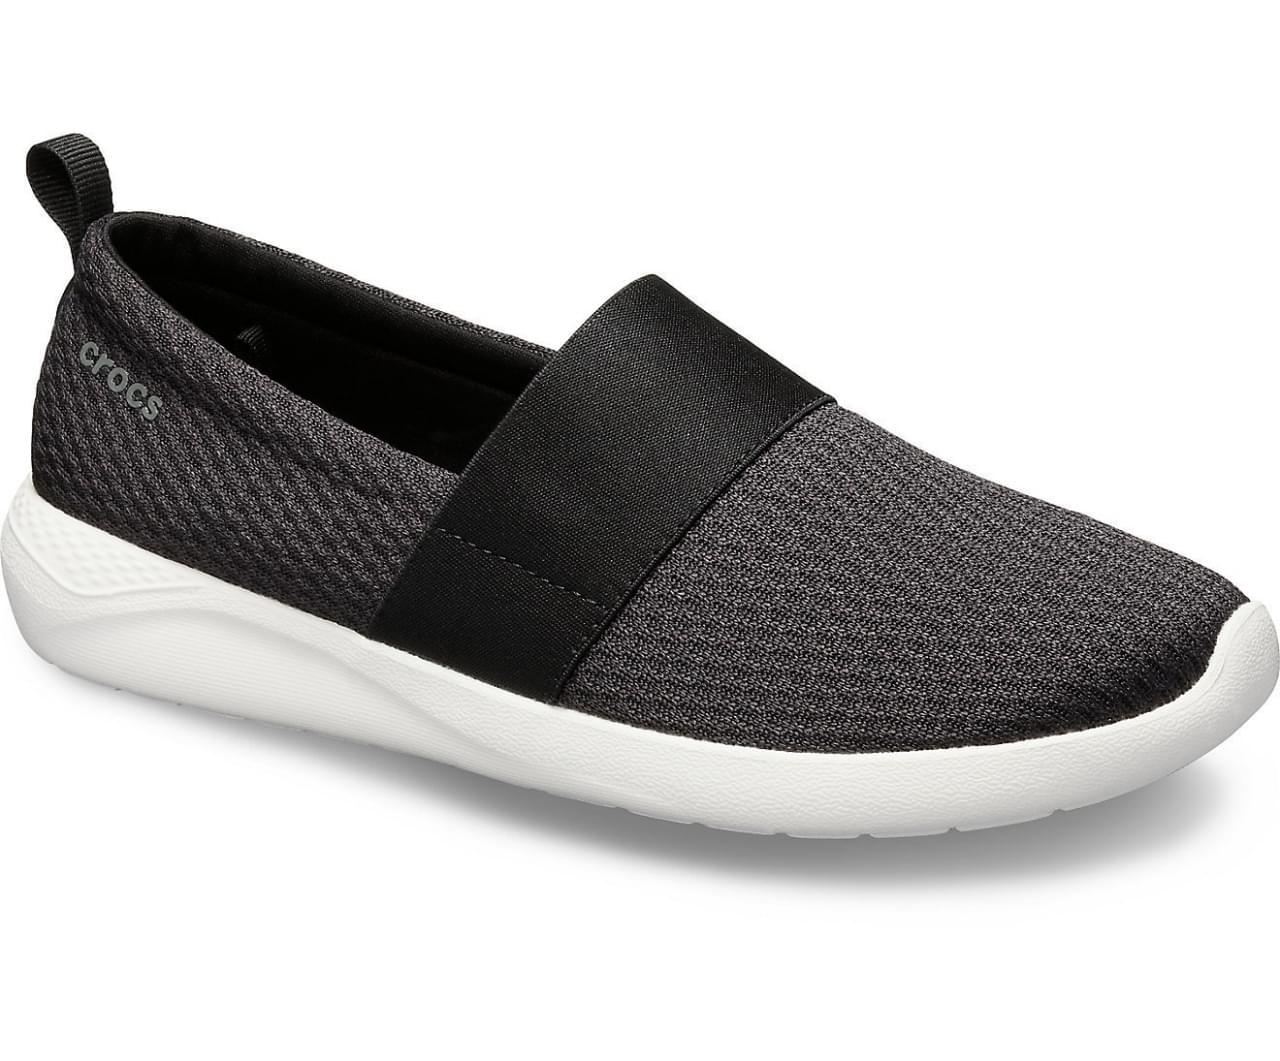 Crocs LiteRide Mesh Slip-On Dames